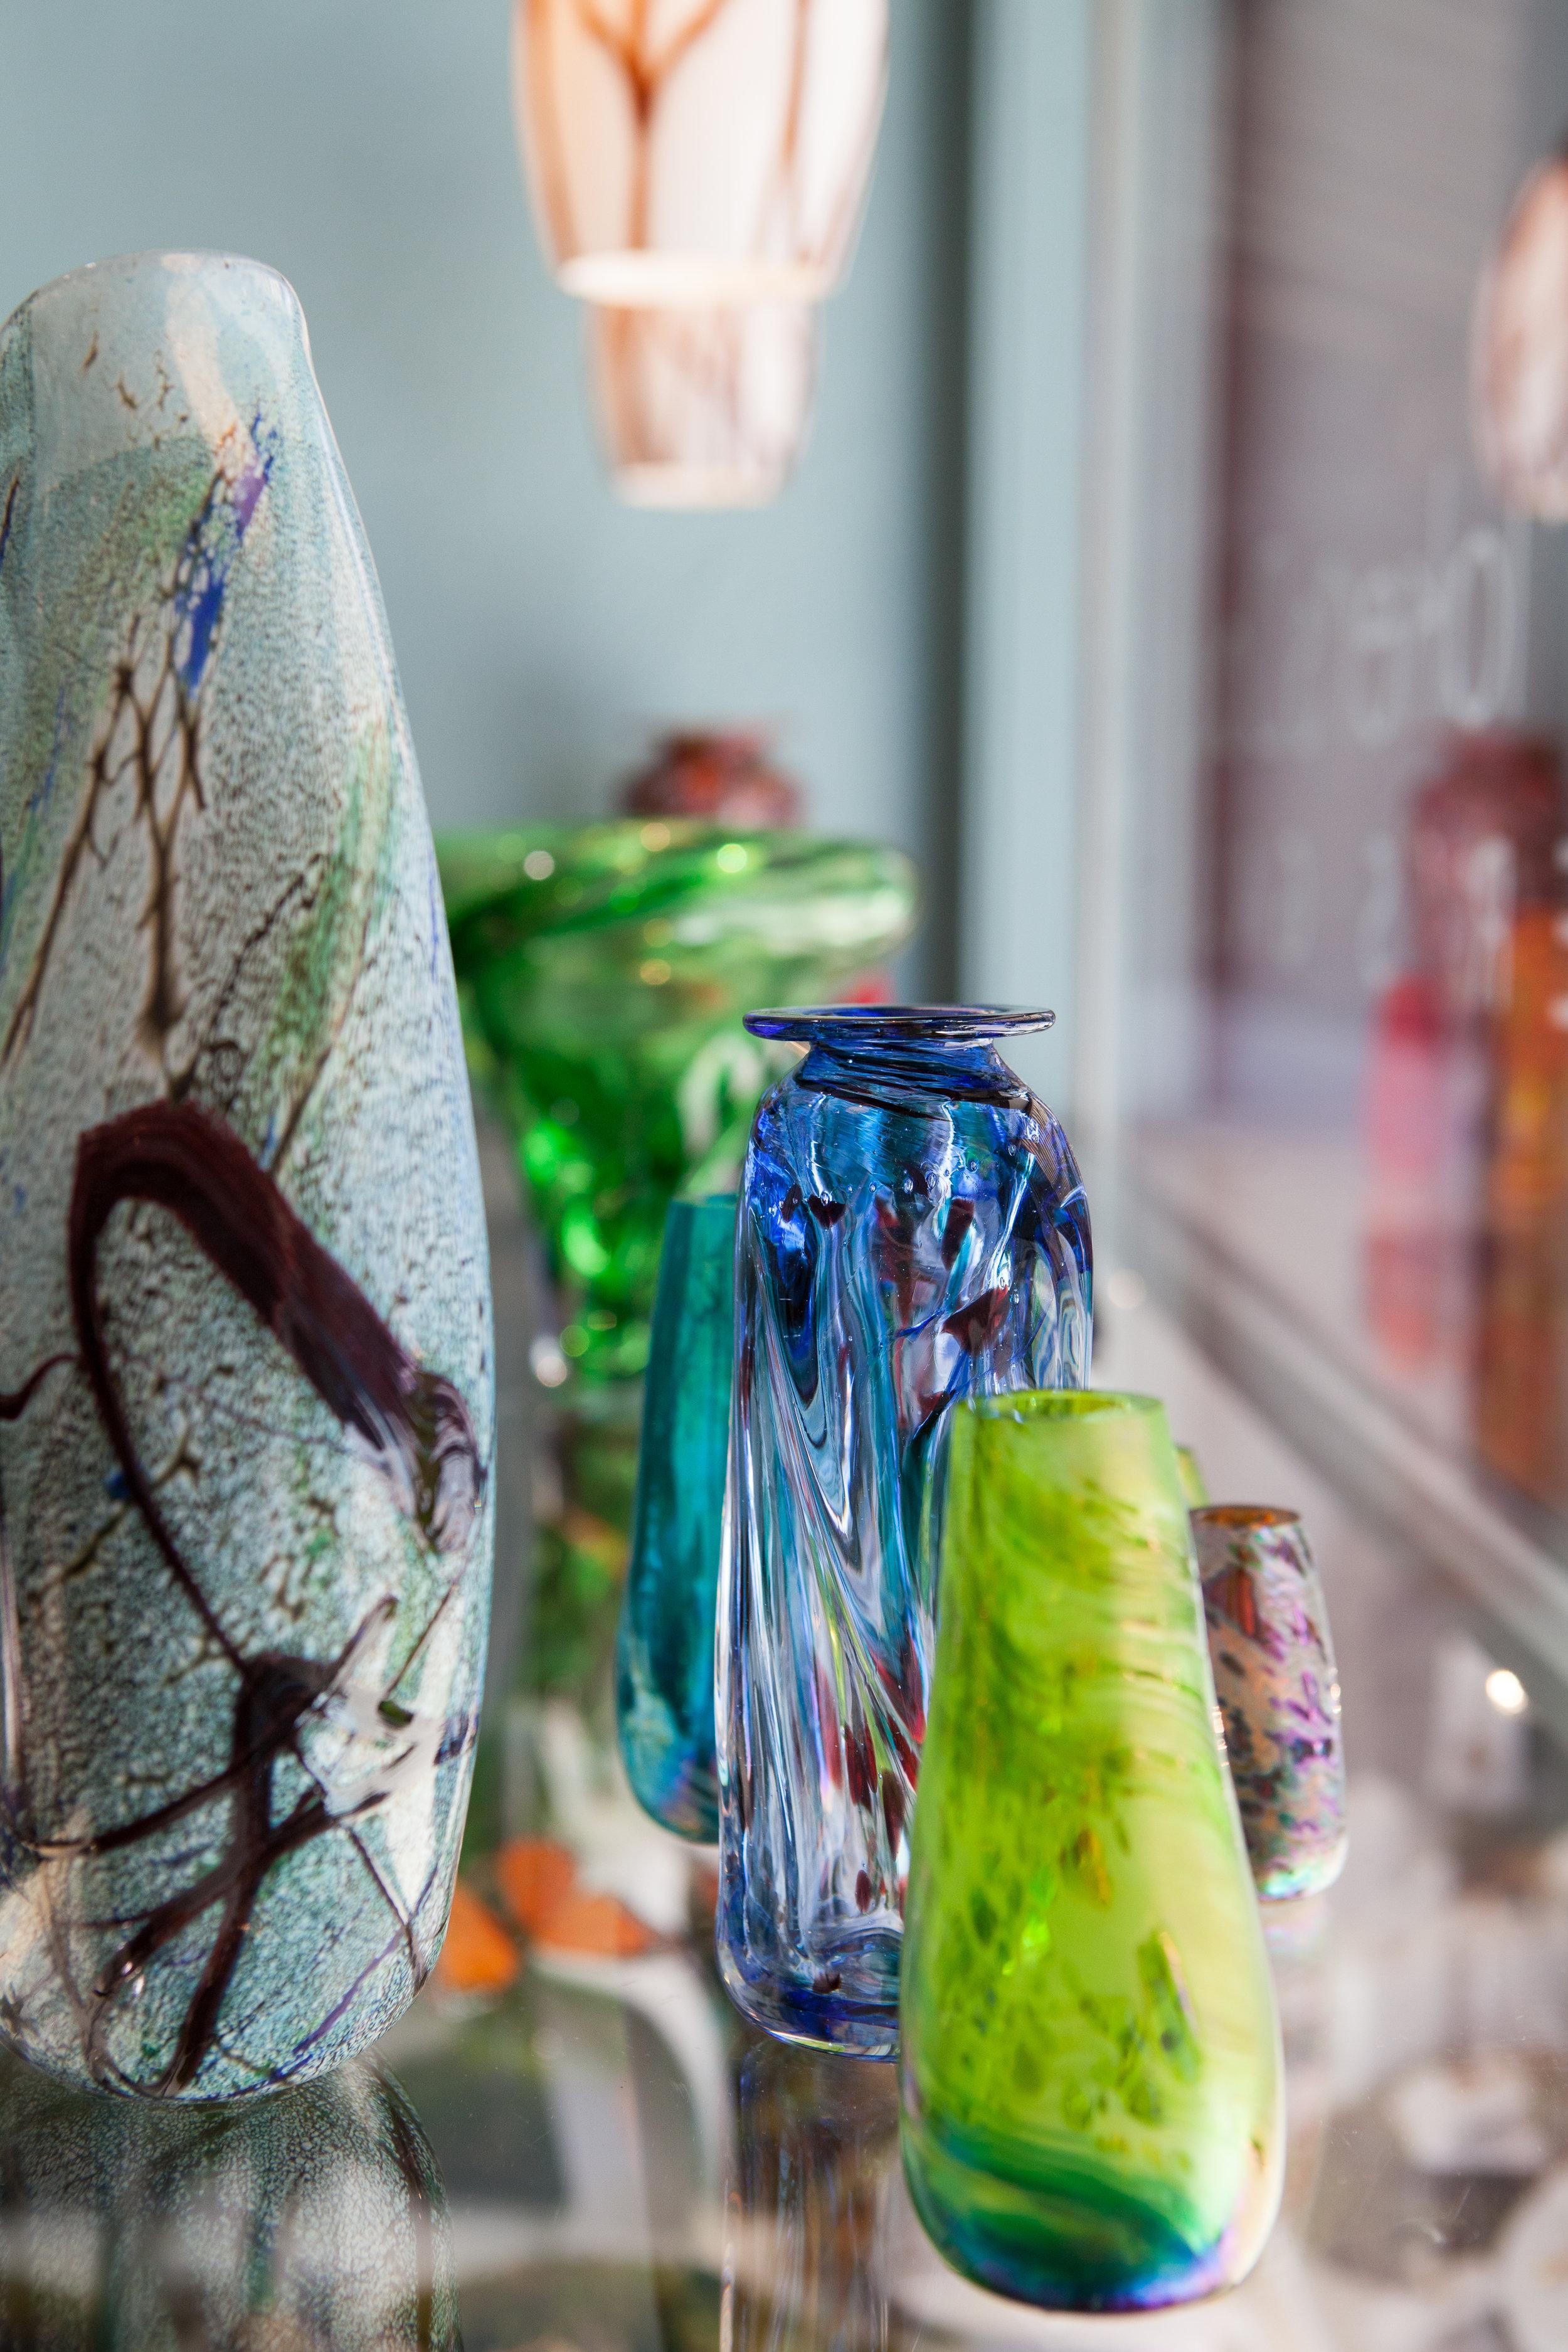 Liquid light glass - Santa Fe, NM - Hand-blown Wabi Sabi glass vases from a contemporary glass studio offering world class glass art.